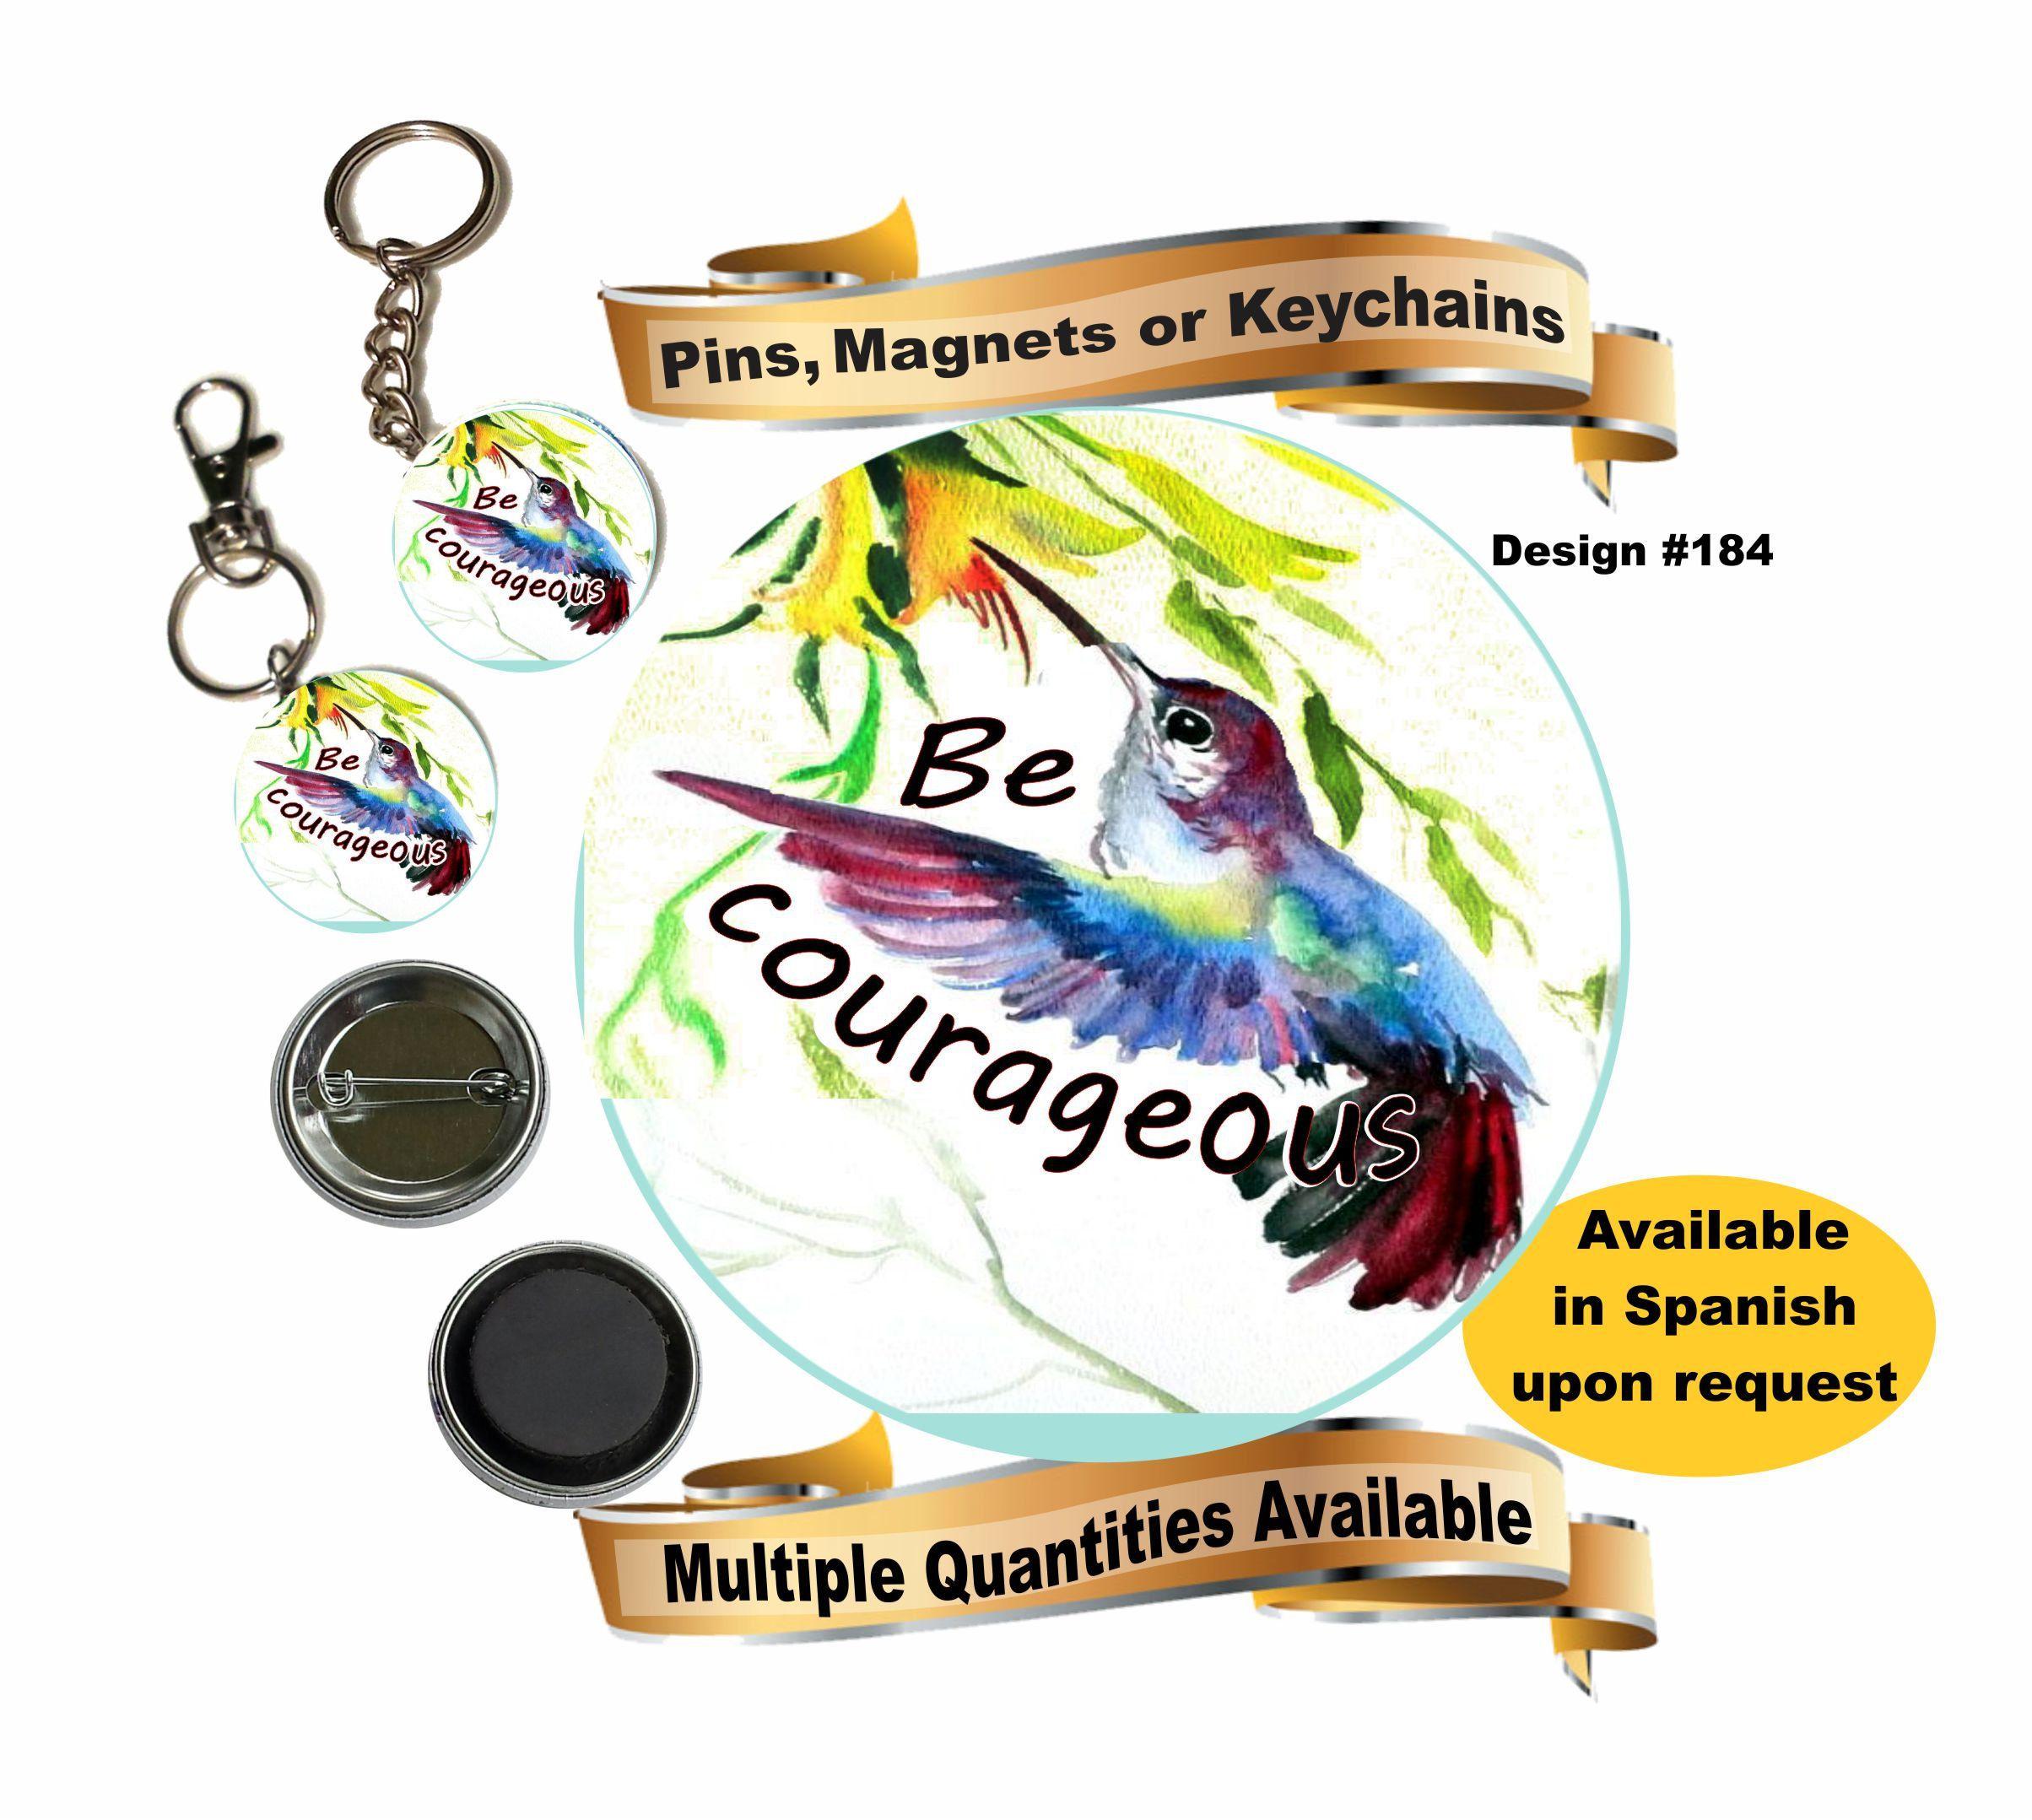 JW gifts/#184/JW pin,magnet,keychain